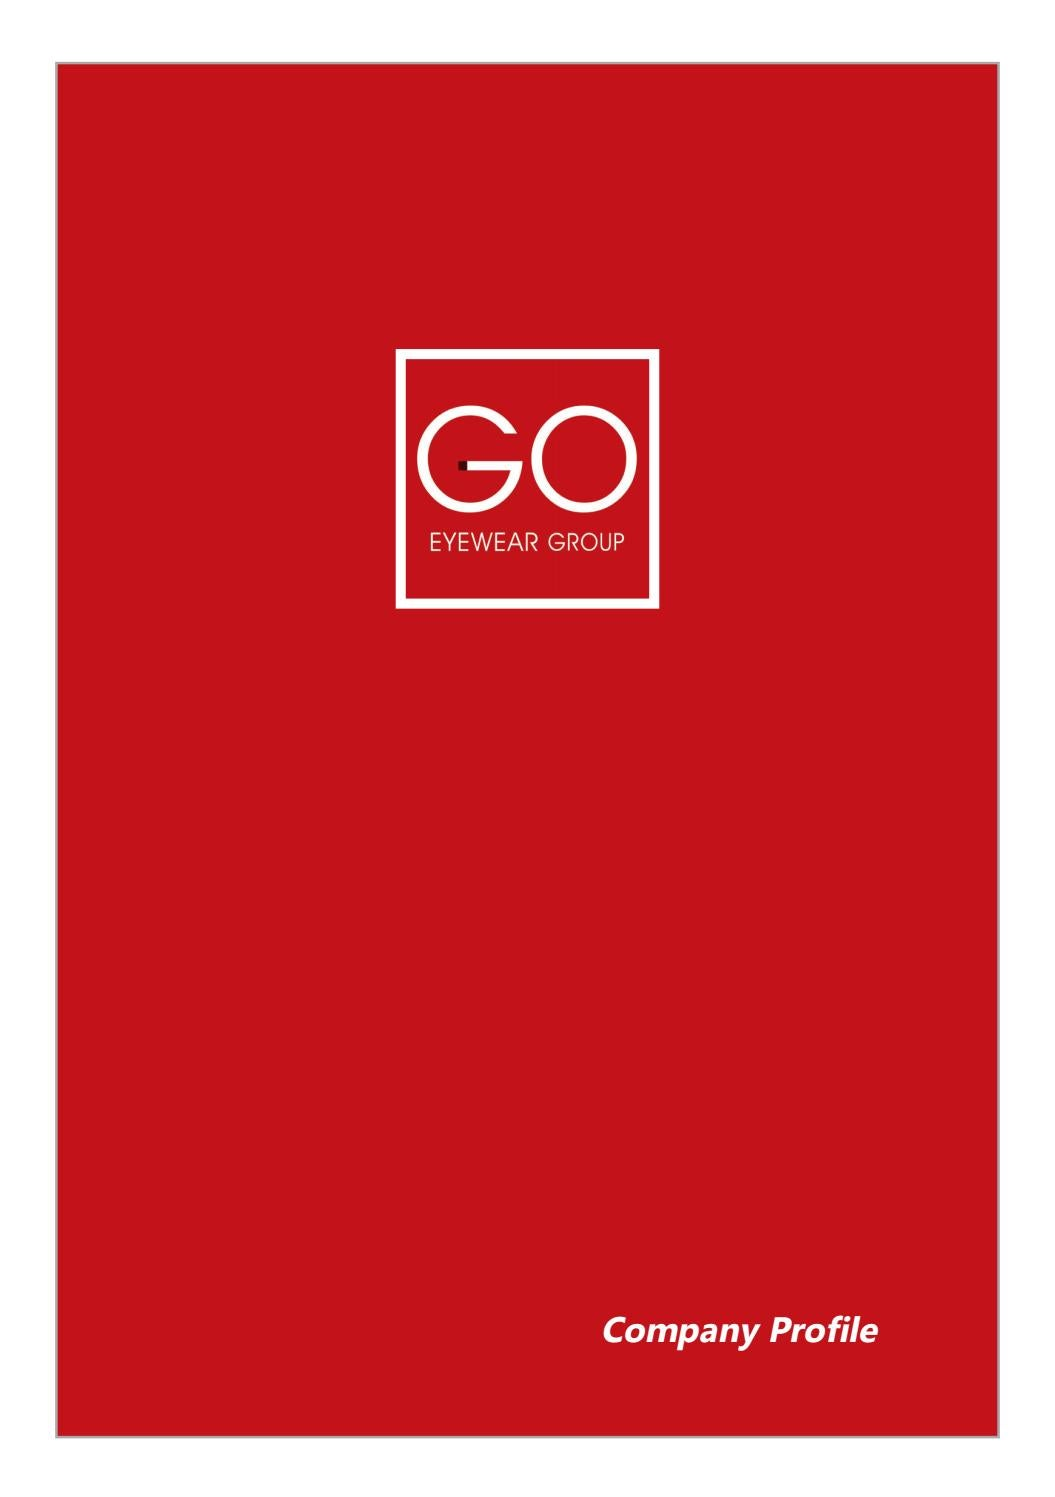 Company Profile English by Go Eyewear Group - issuu 00fabd19b8